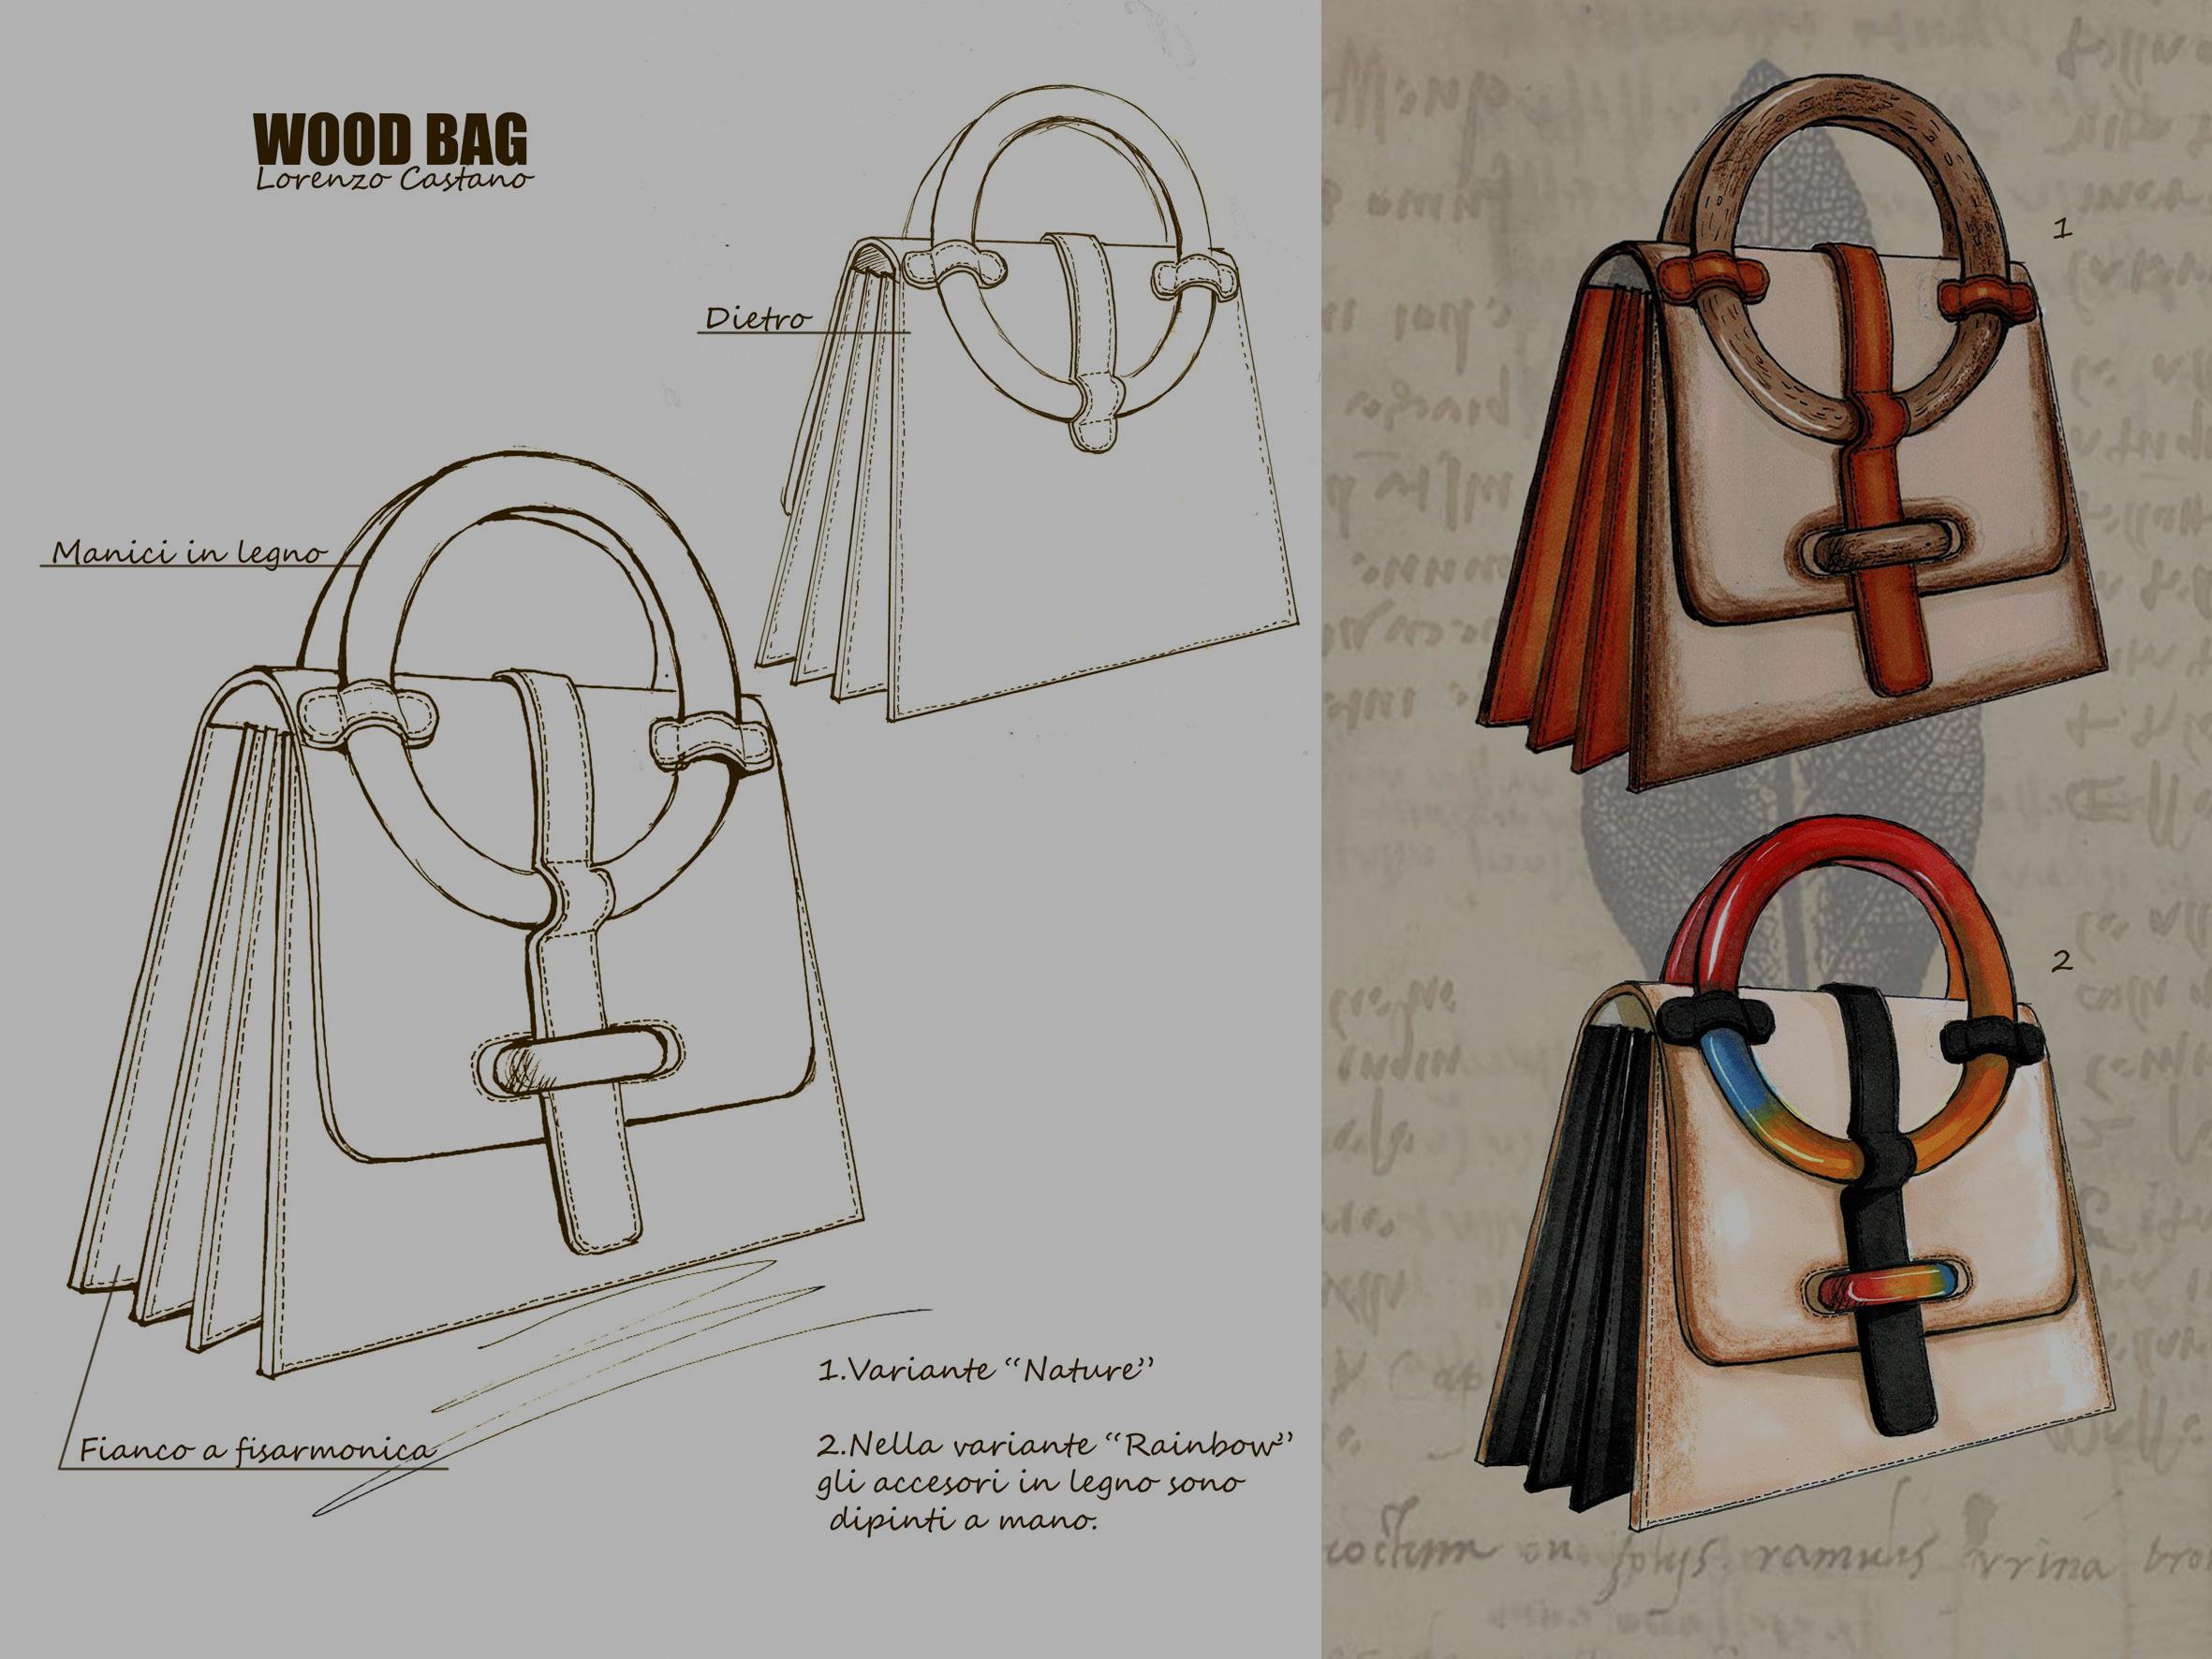 ITALY STUDENT DESIGN COMPETITION: Lorenzo Castano